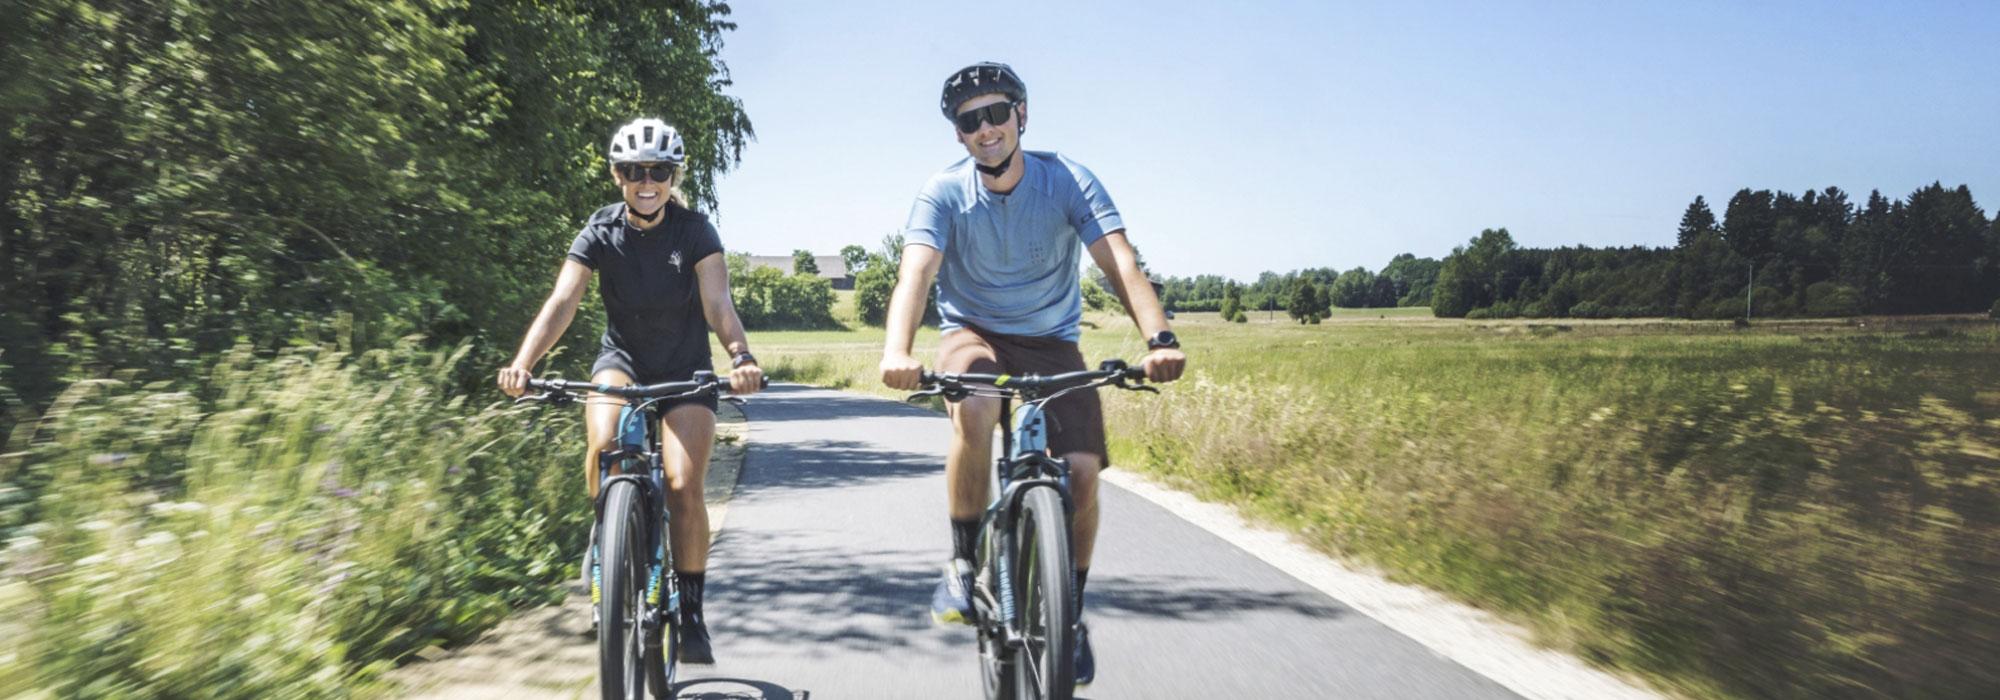 Landhotel Gasthof Cramer Leihräder E-Bikes